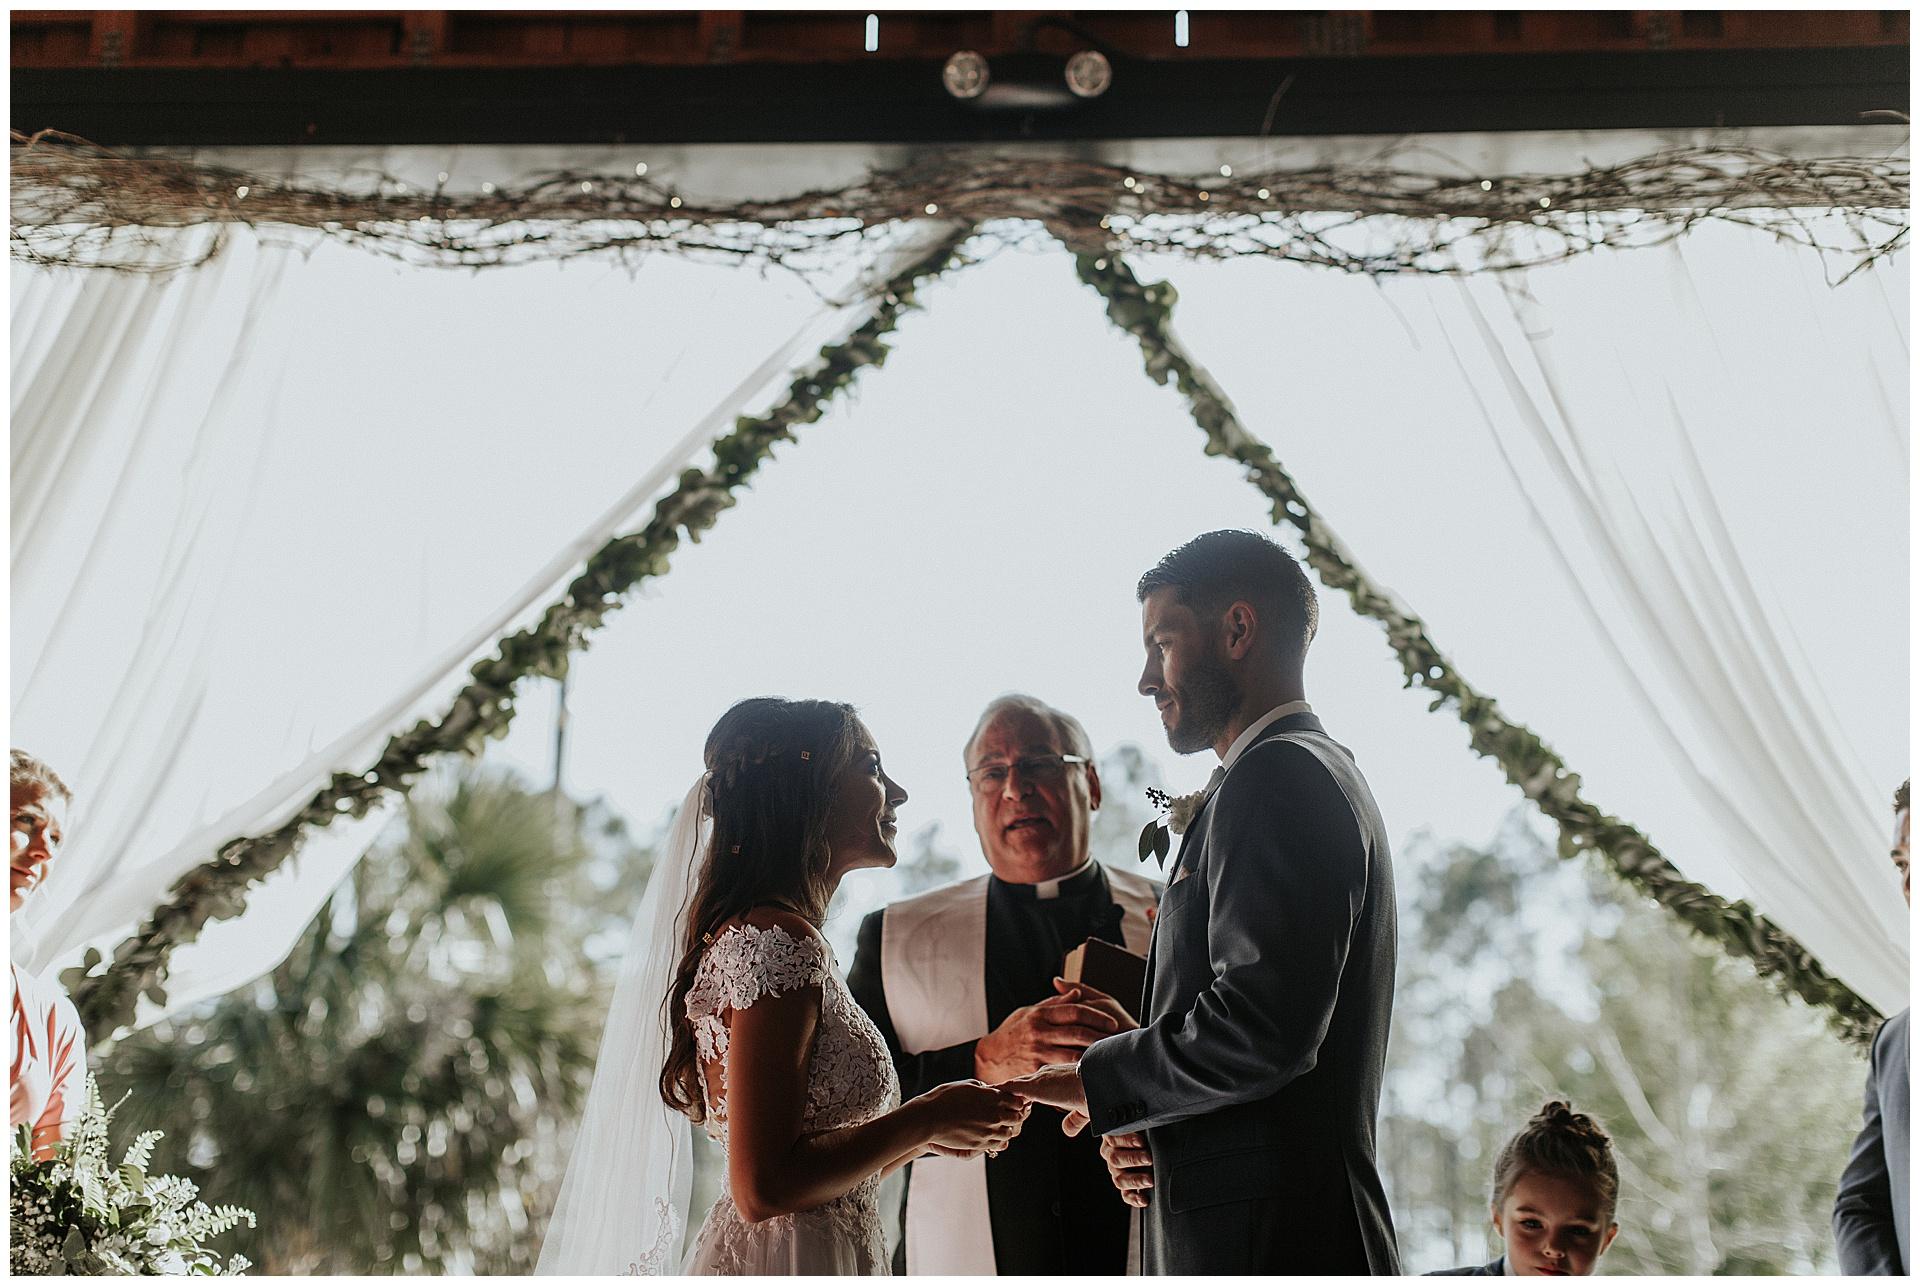 st augustine wedding photographer_mia dimare photography20.jpg